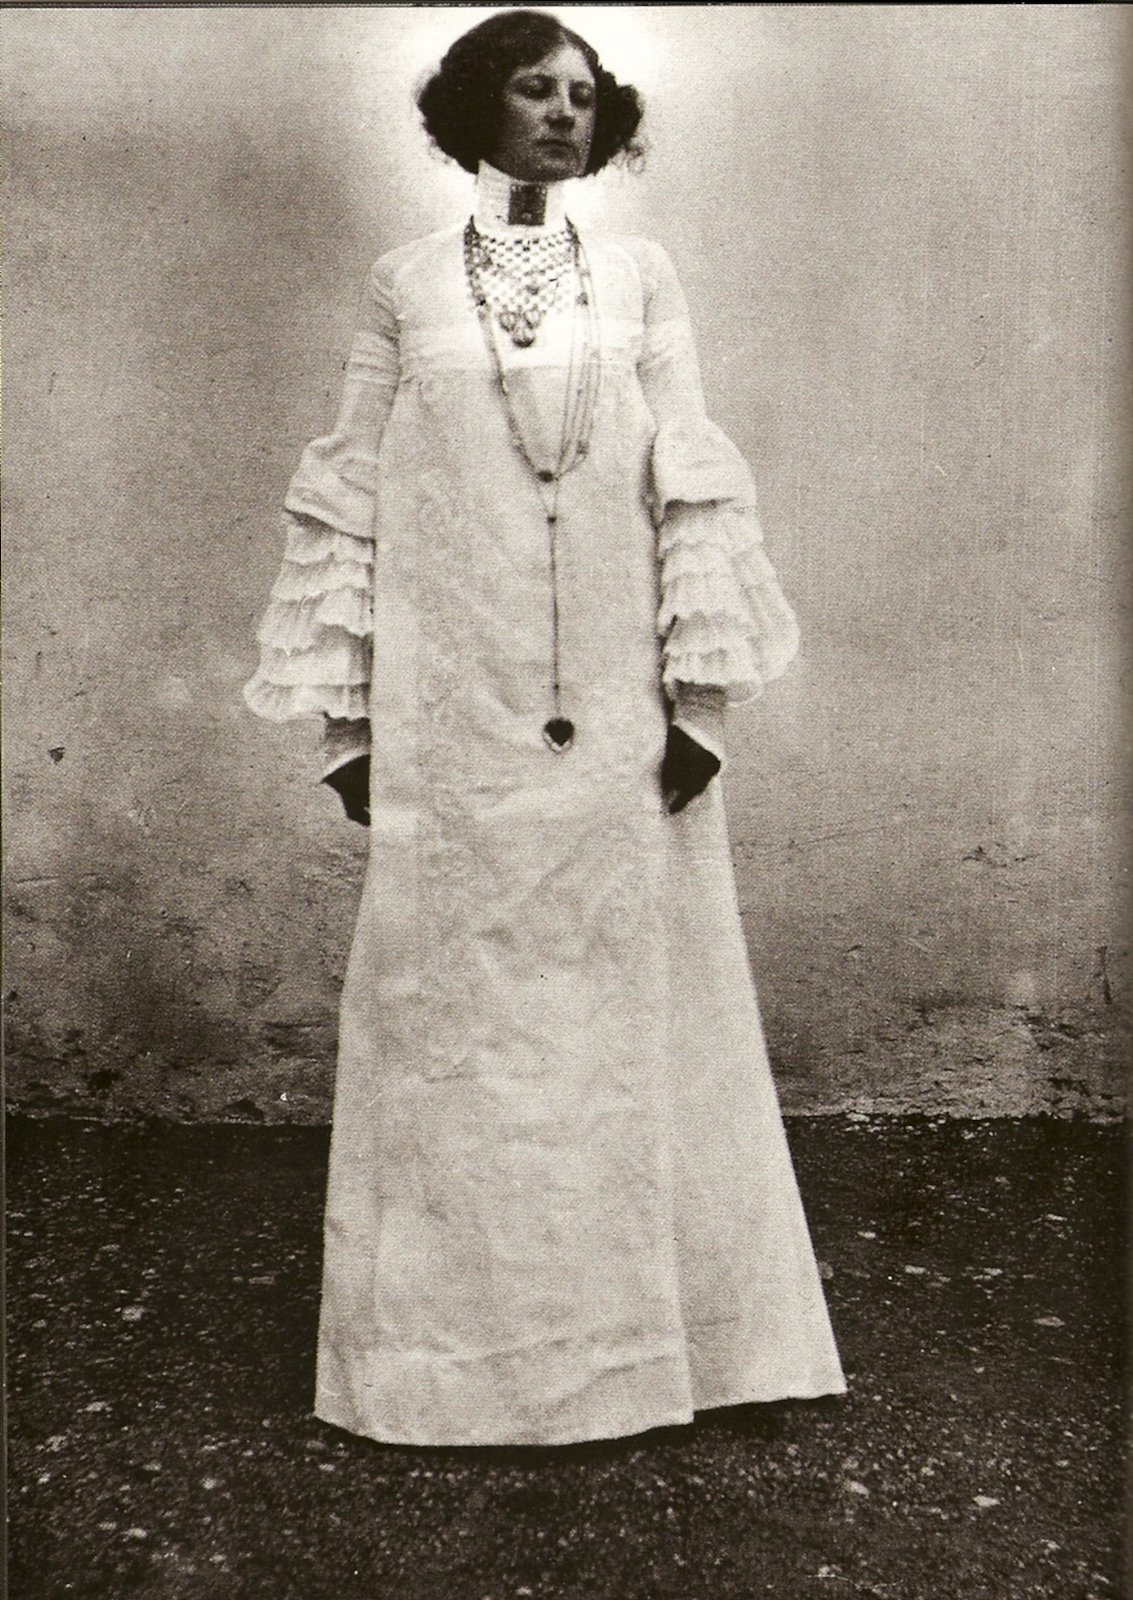 Emilie Louise Flöge